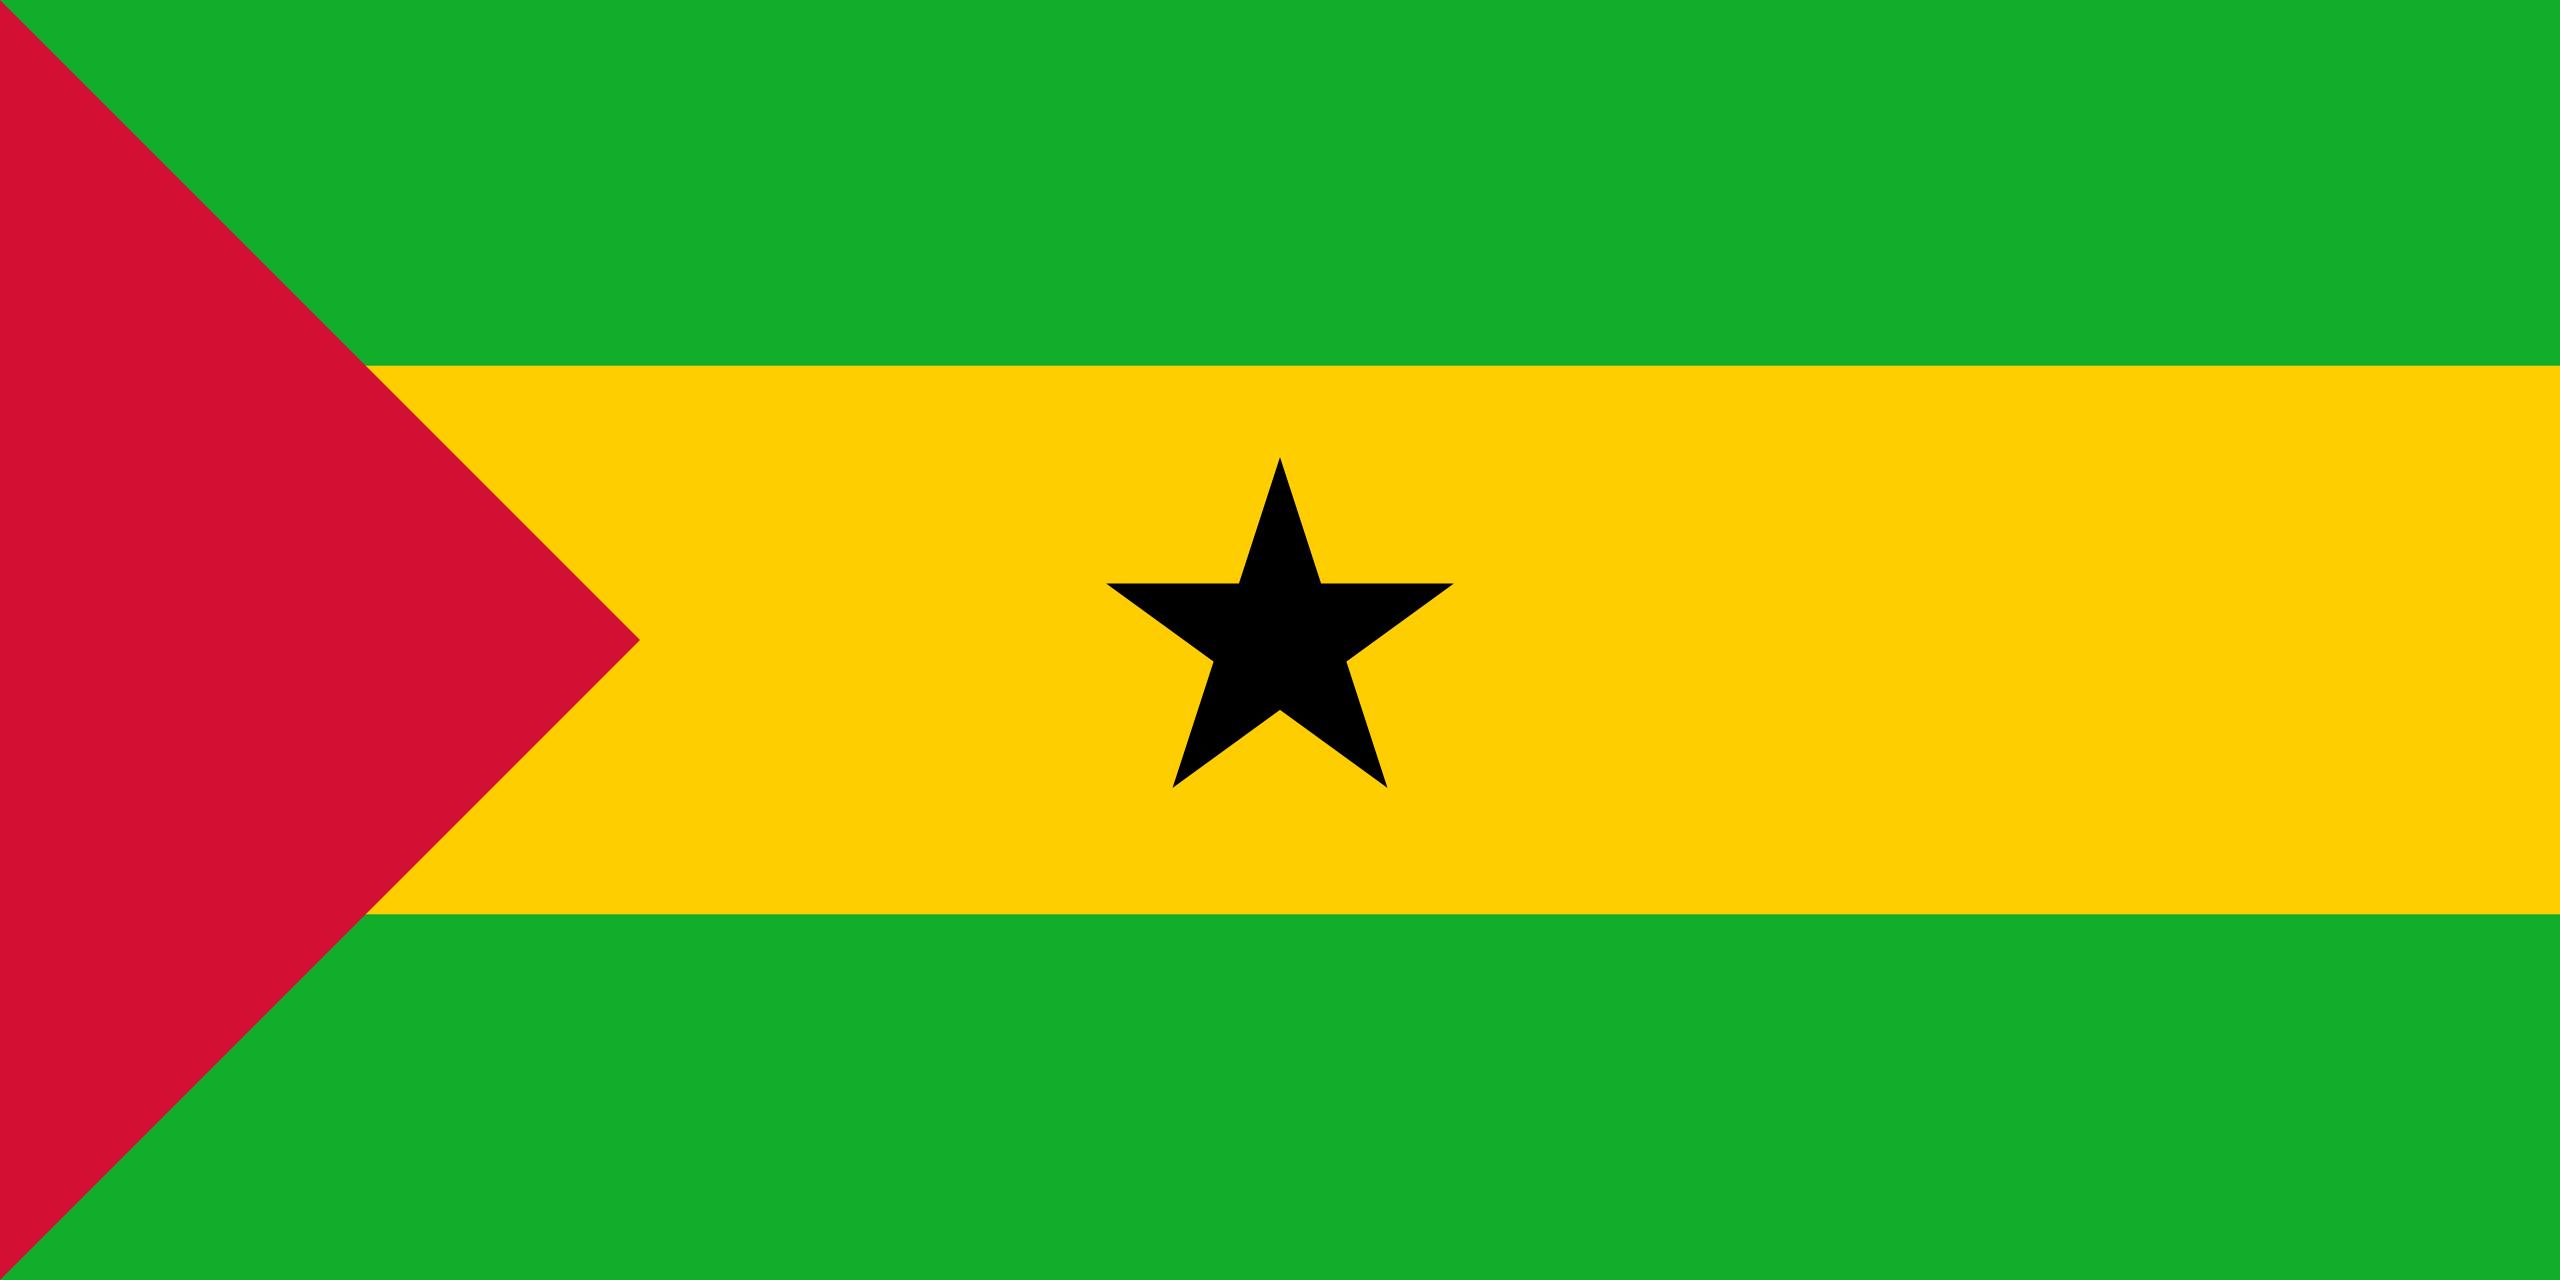 santo tomé y príncipe, देश, emblema, लोग�प्रतीकbolo - HD वॉलपेपर - प्रोफेसर-falken.com